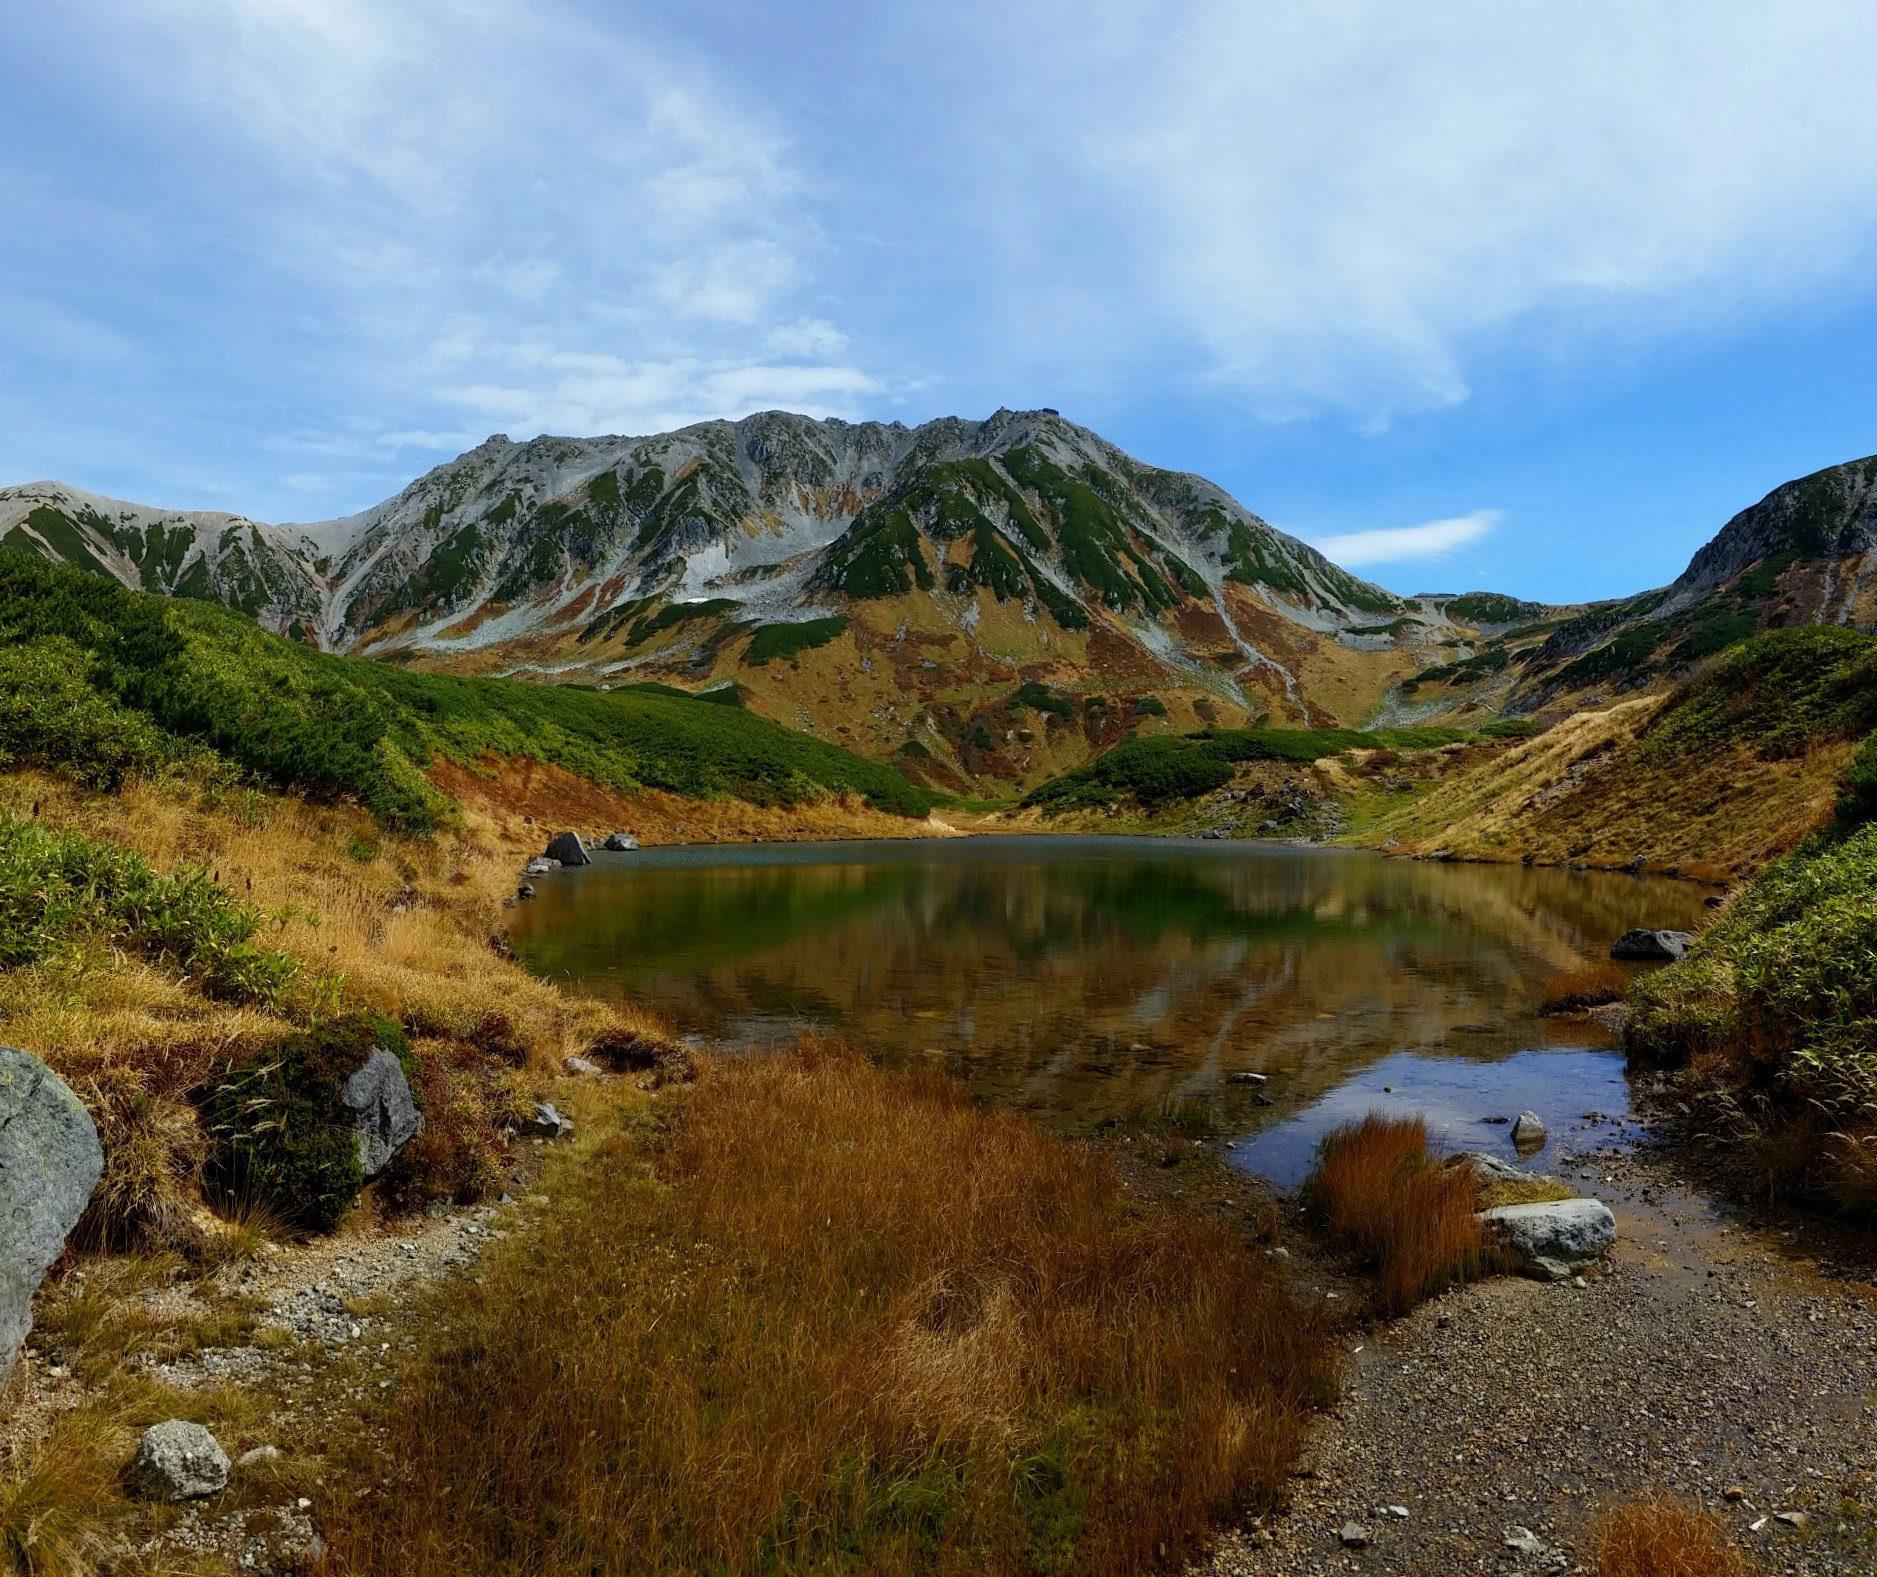 Murodo on the Tateyama Kurobe Alpine Route in Japan